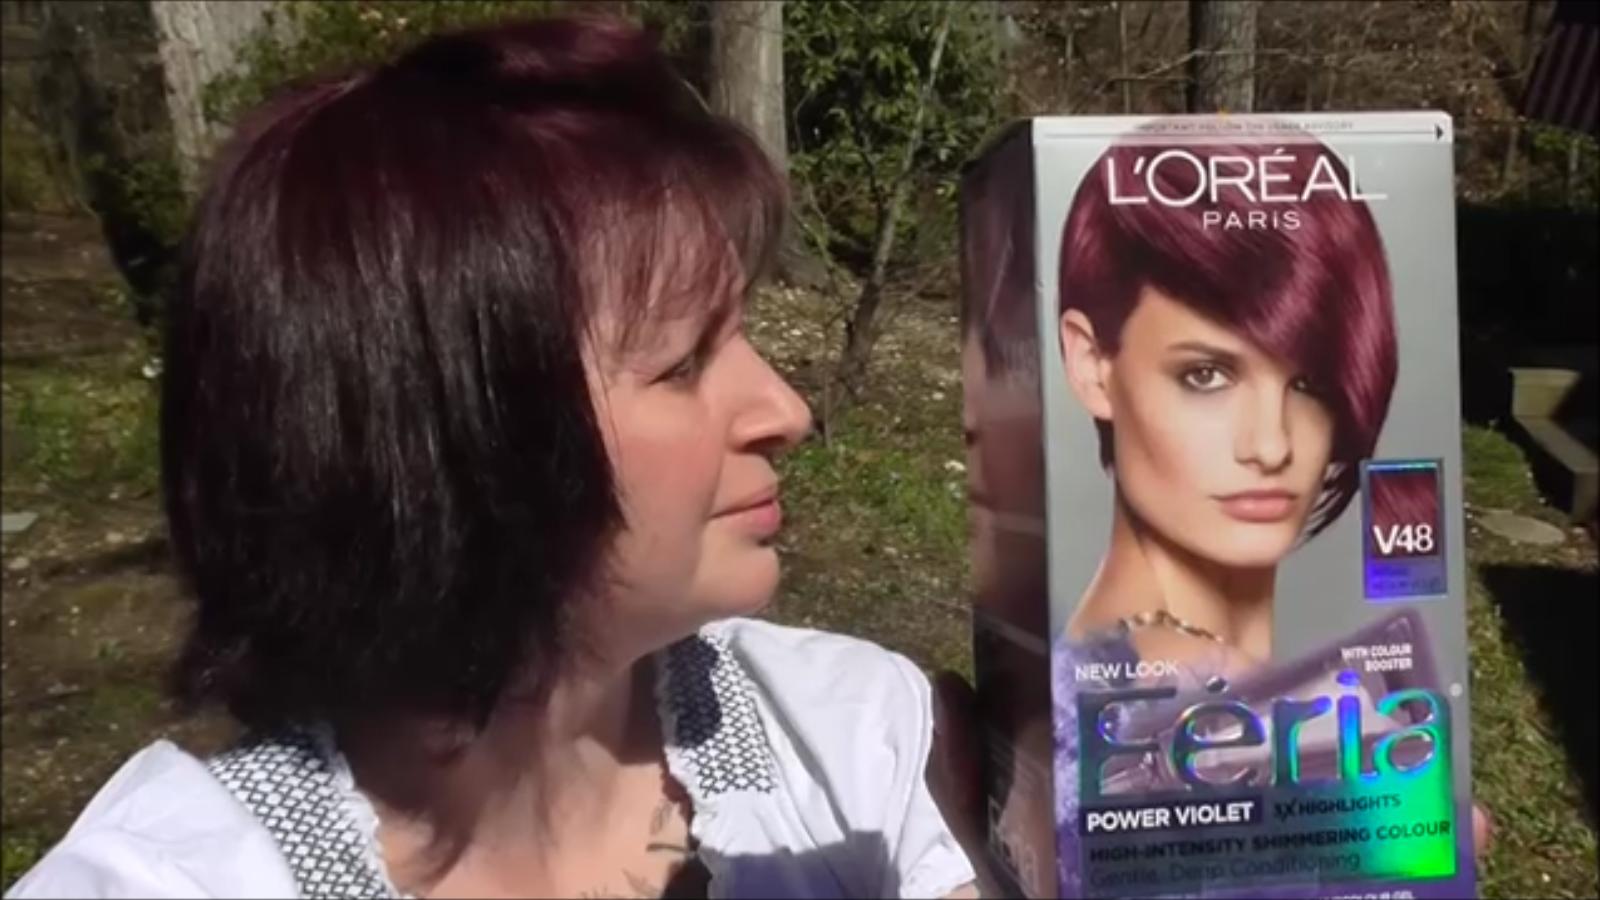 REVIEW: Feria Power Violet Intense Medium Violet V48 Hair ...